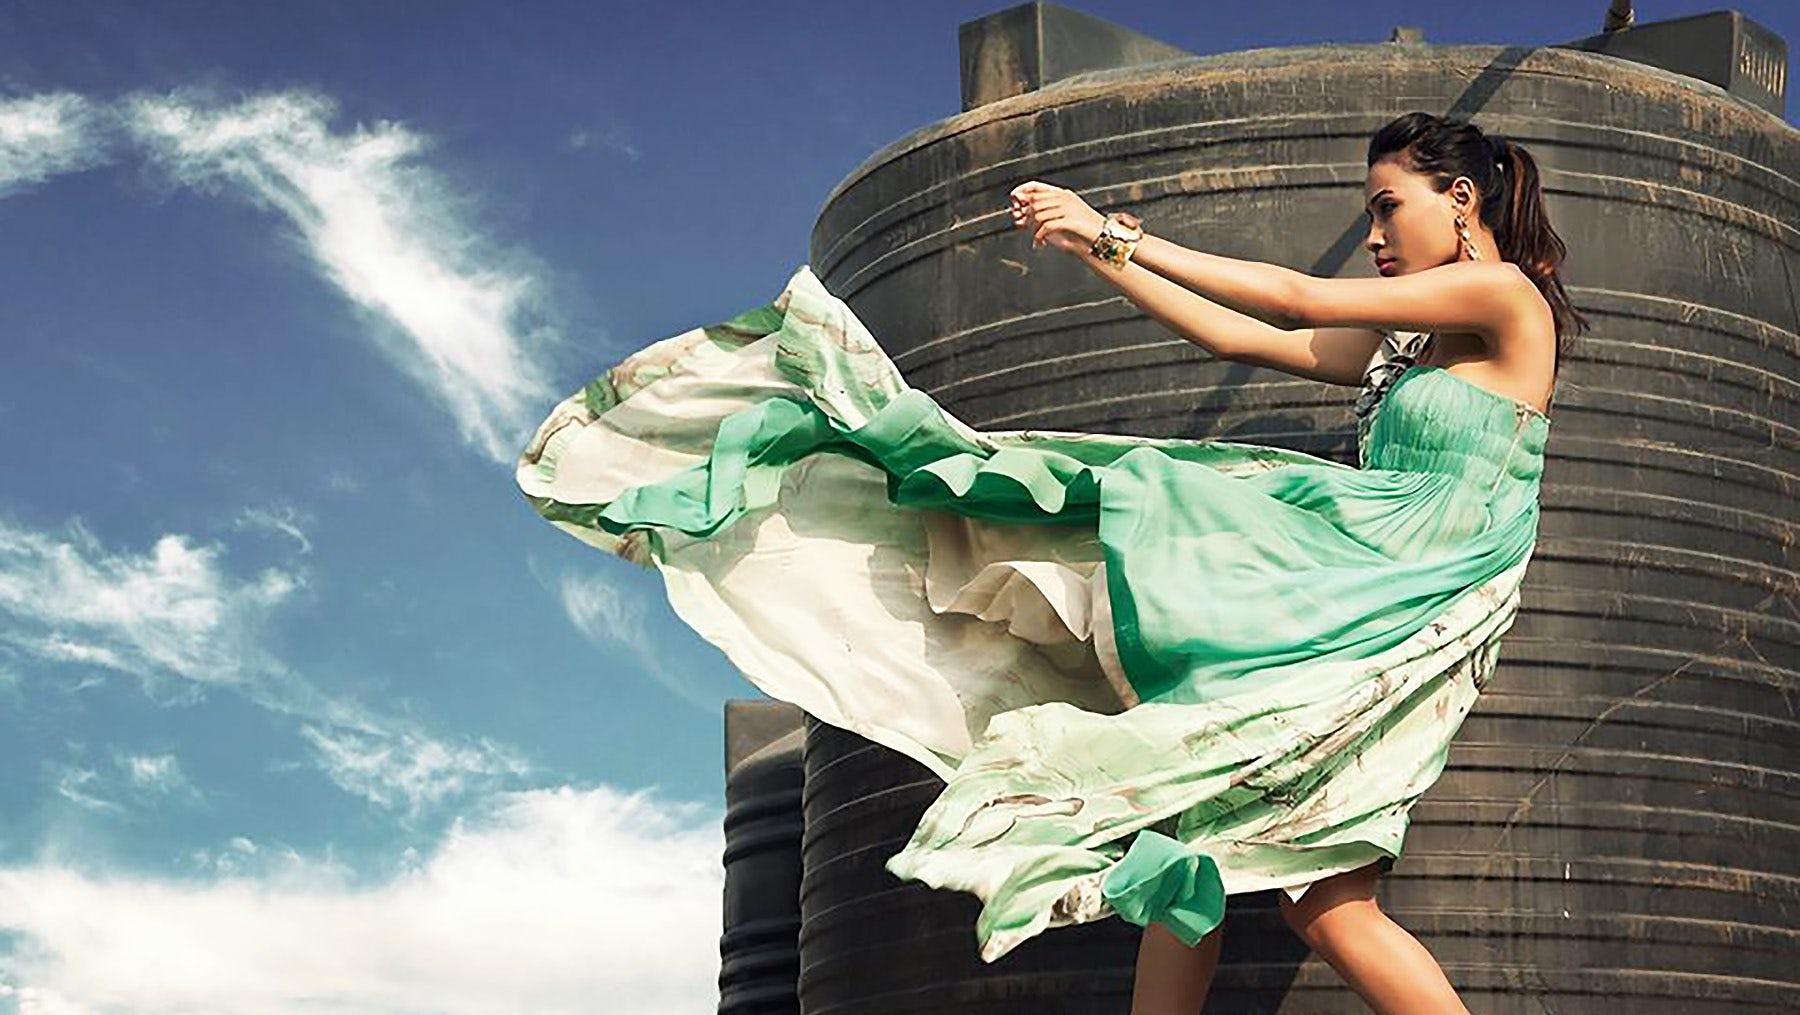 A design sold by Kimaya Fashions | Source: Kimaya Fashions